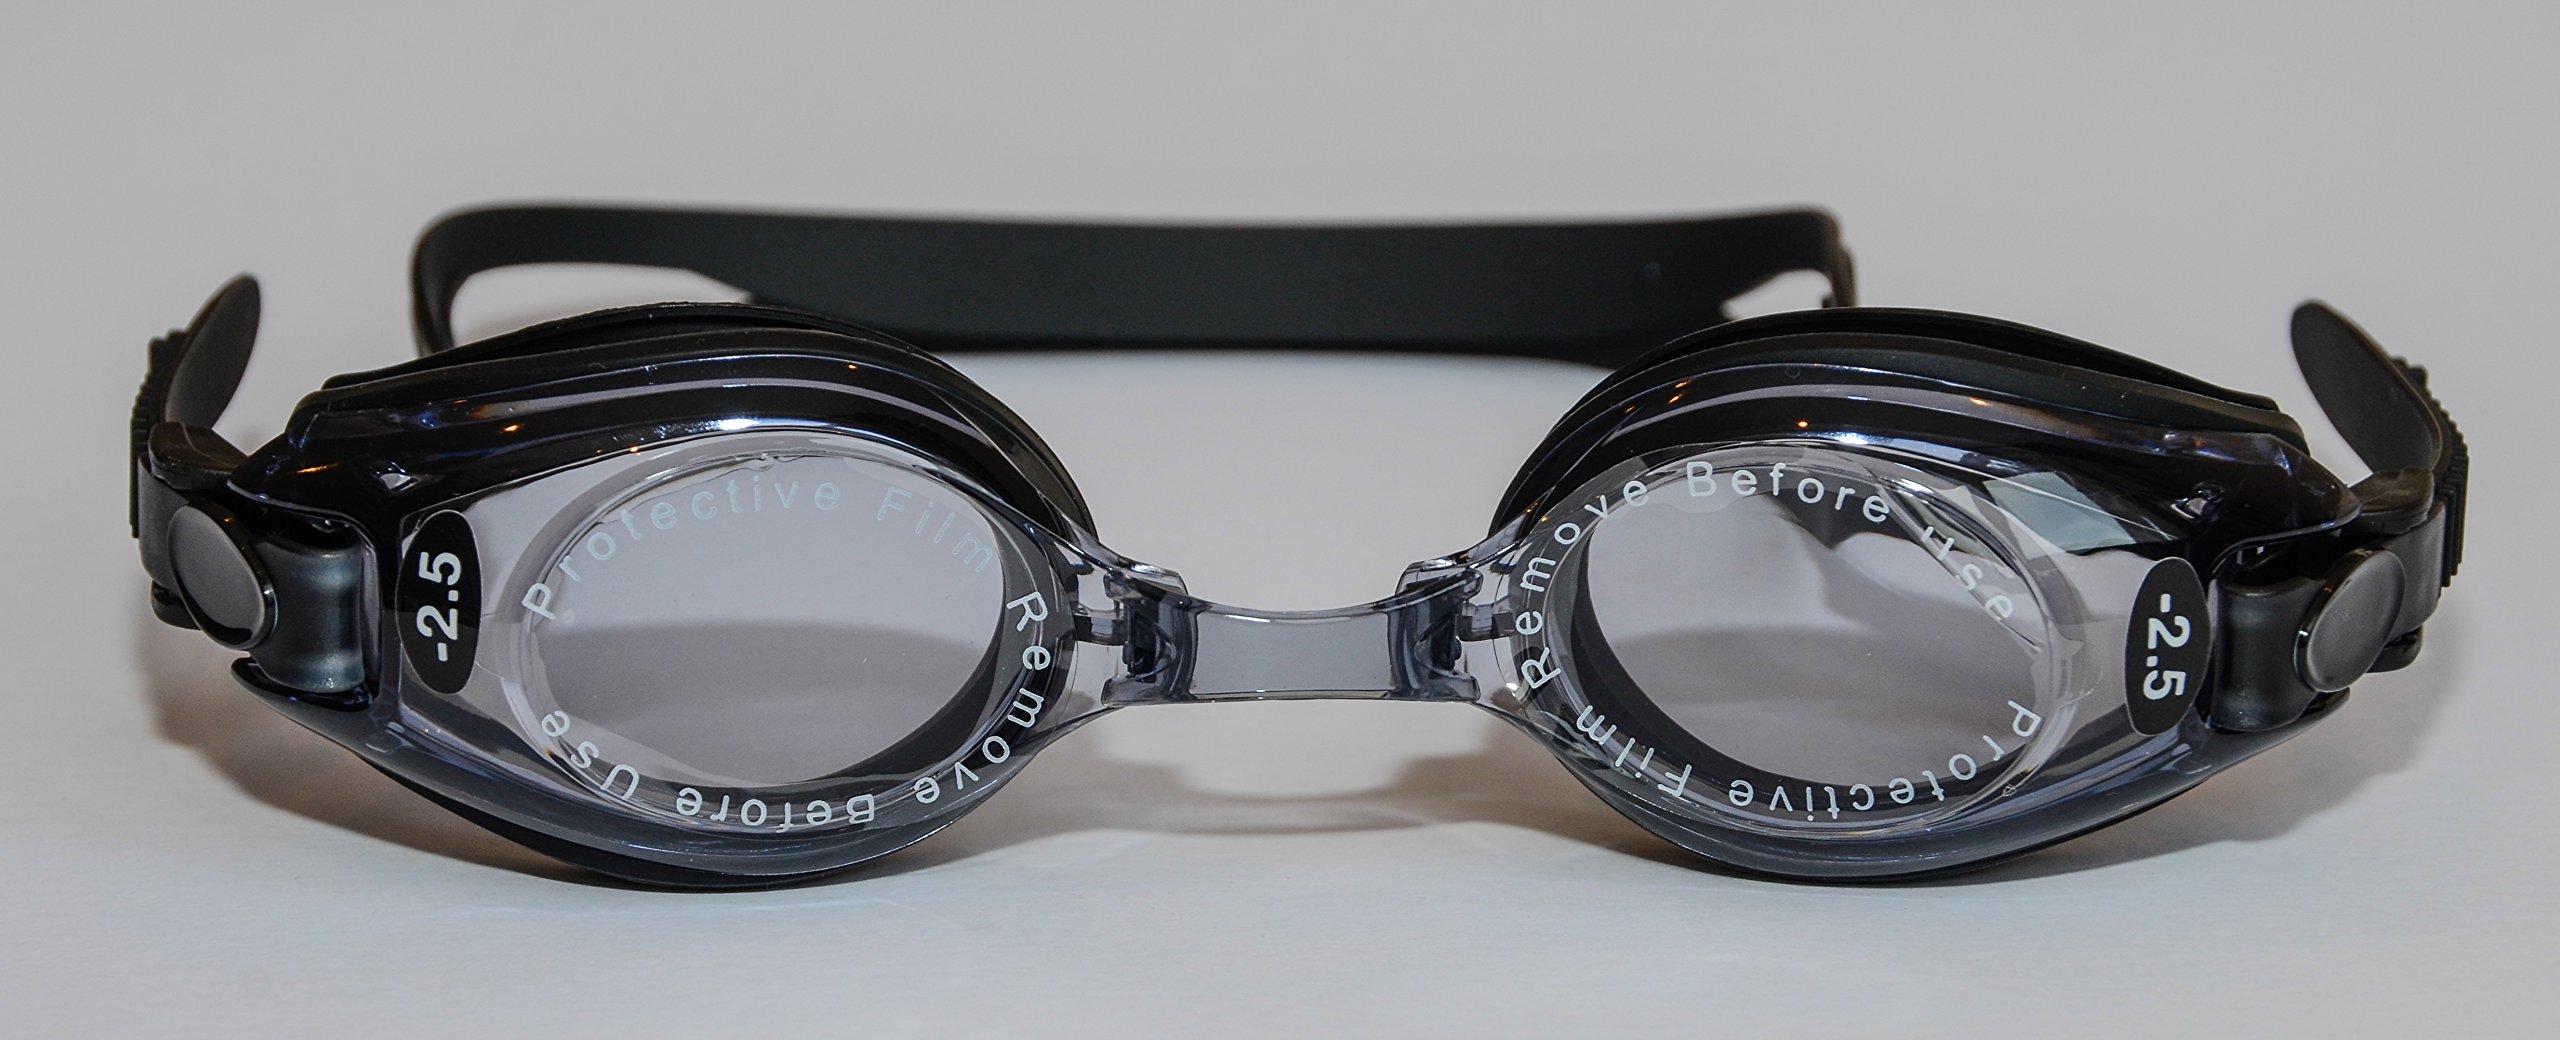 Sports Vision's Prescription Optical Swimming Goggles +2.00 Kids